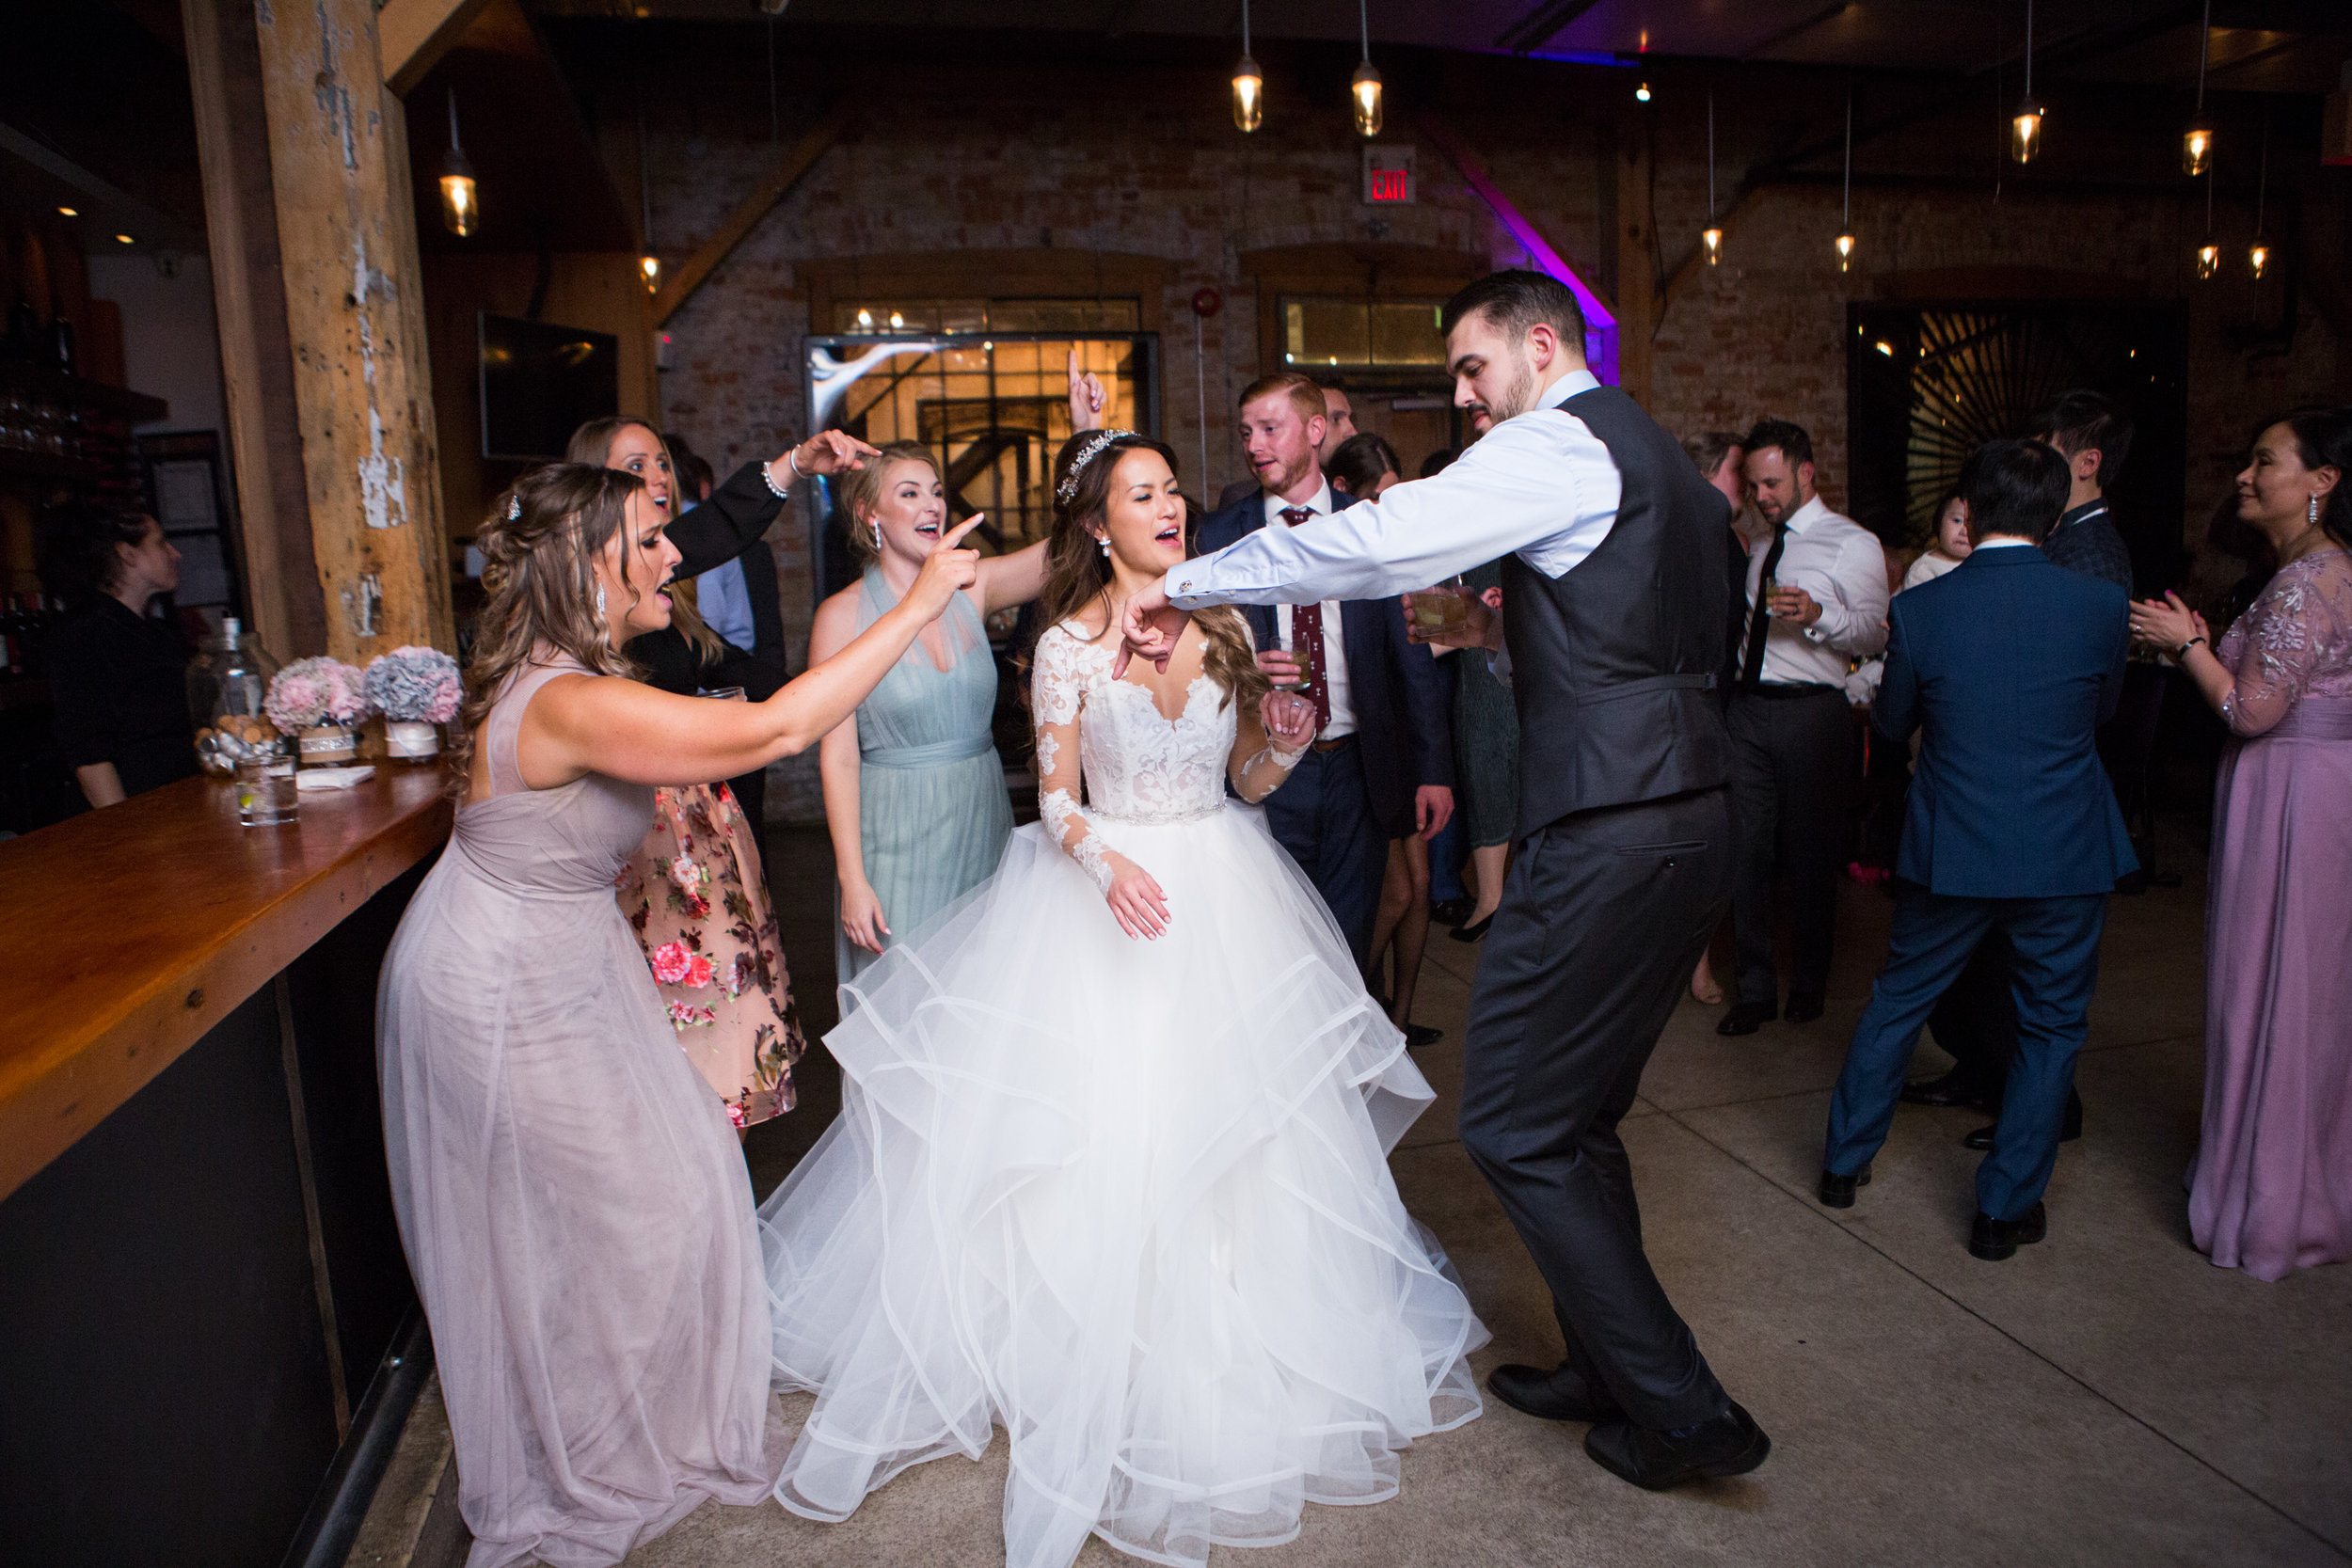 Wedding guests dancing at Archeo Distillery District Toronto